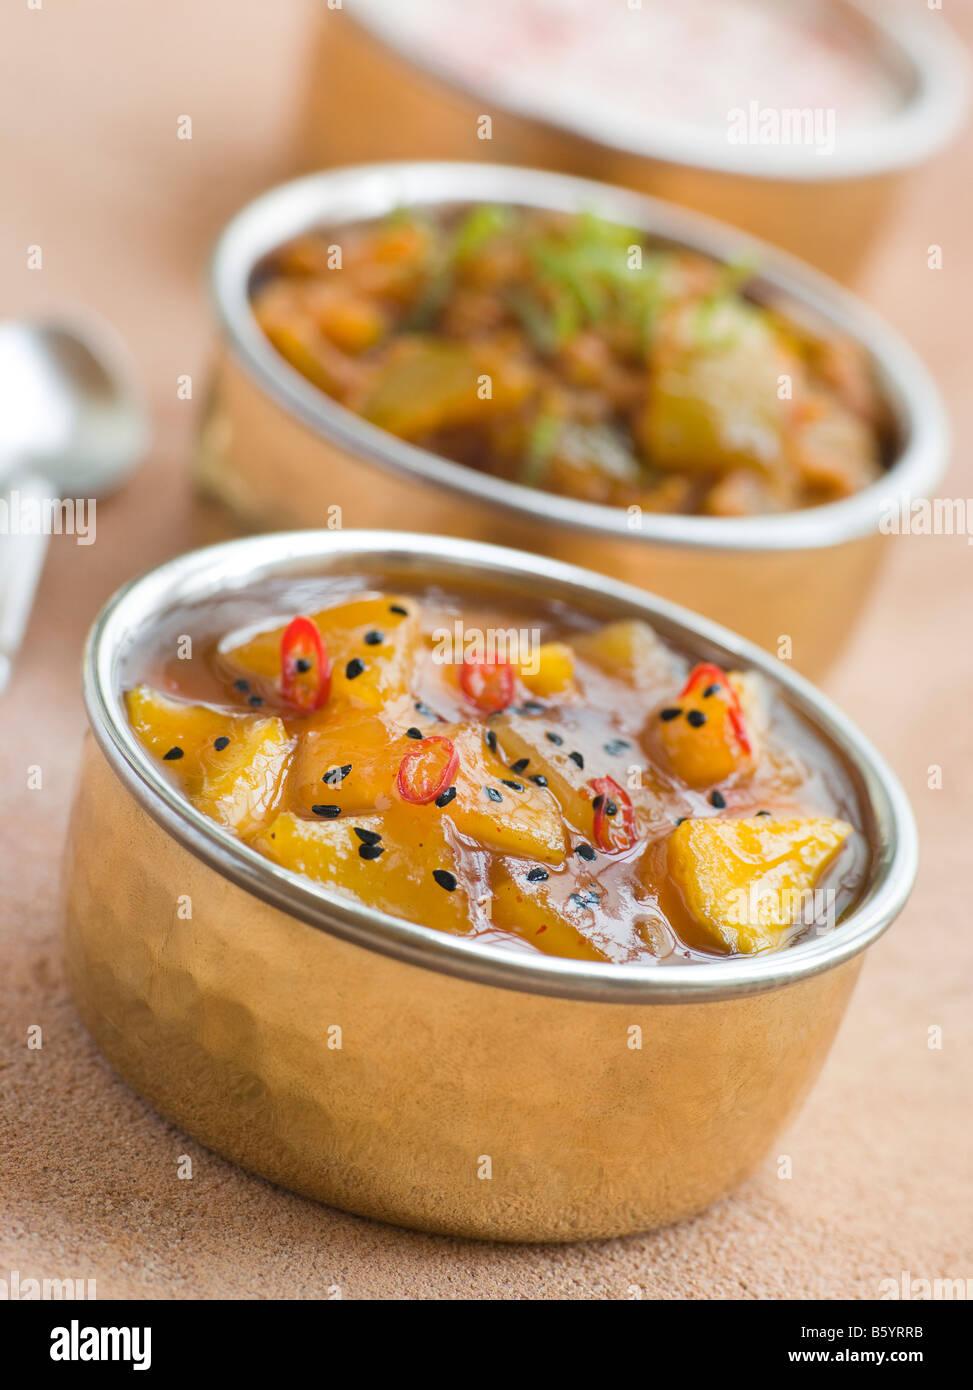 Mango Chutney with Lime Pickle and Raita - Stock Image